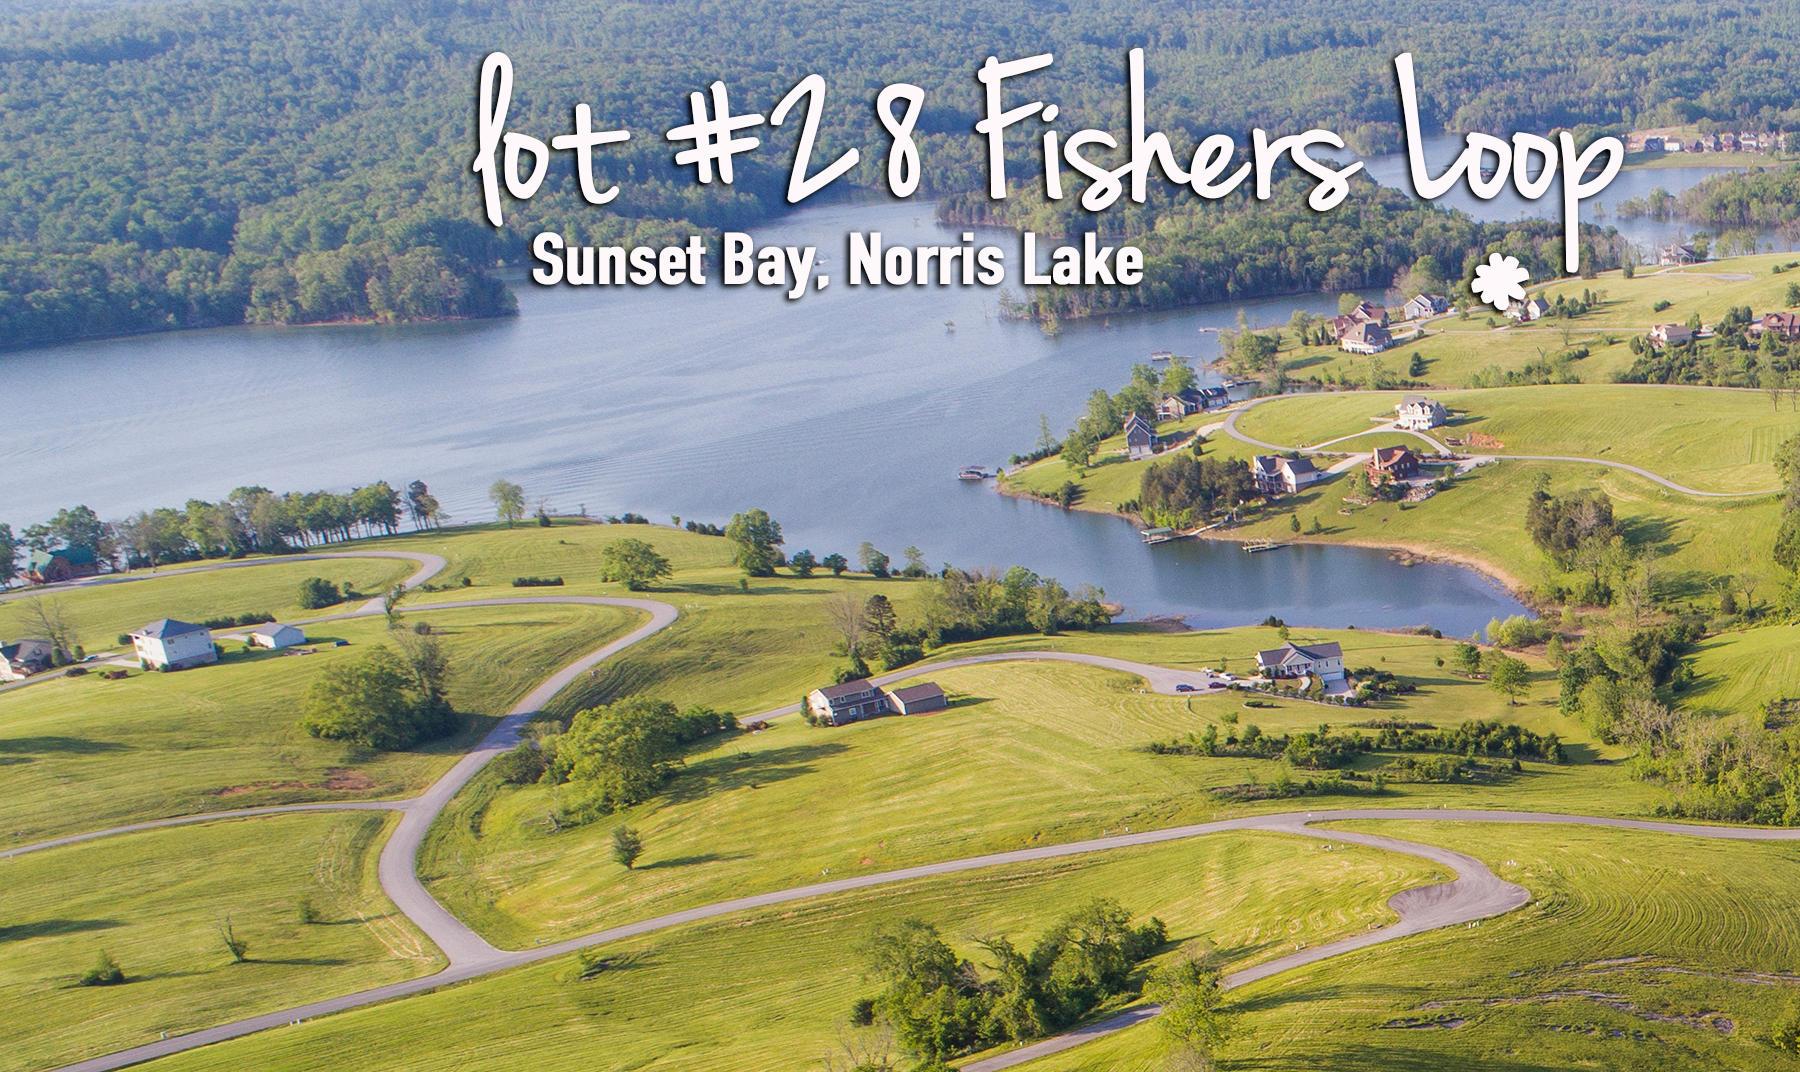 Lot 28 Fishers Loop: